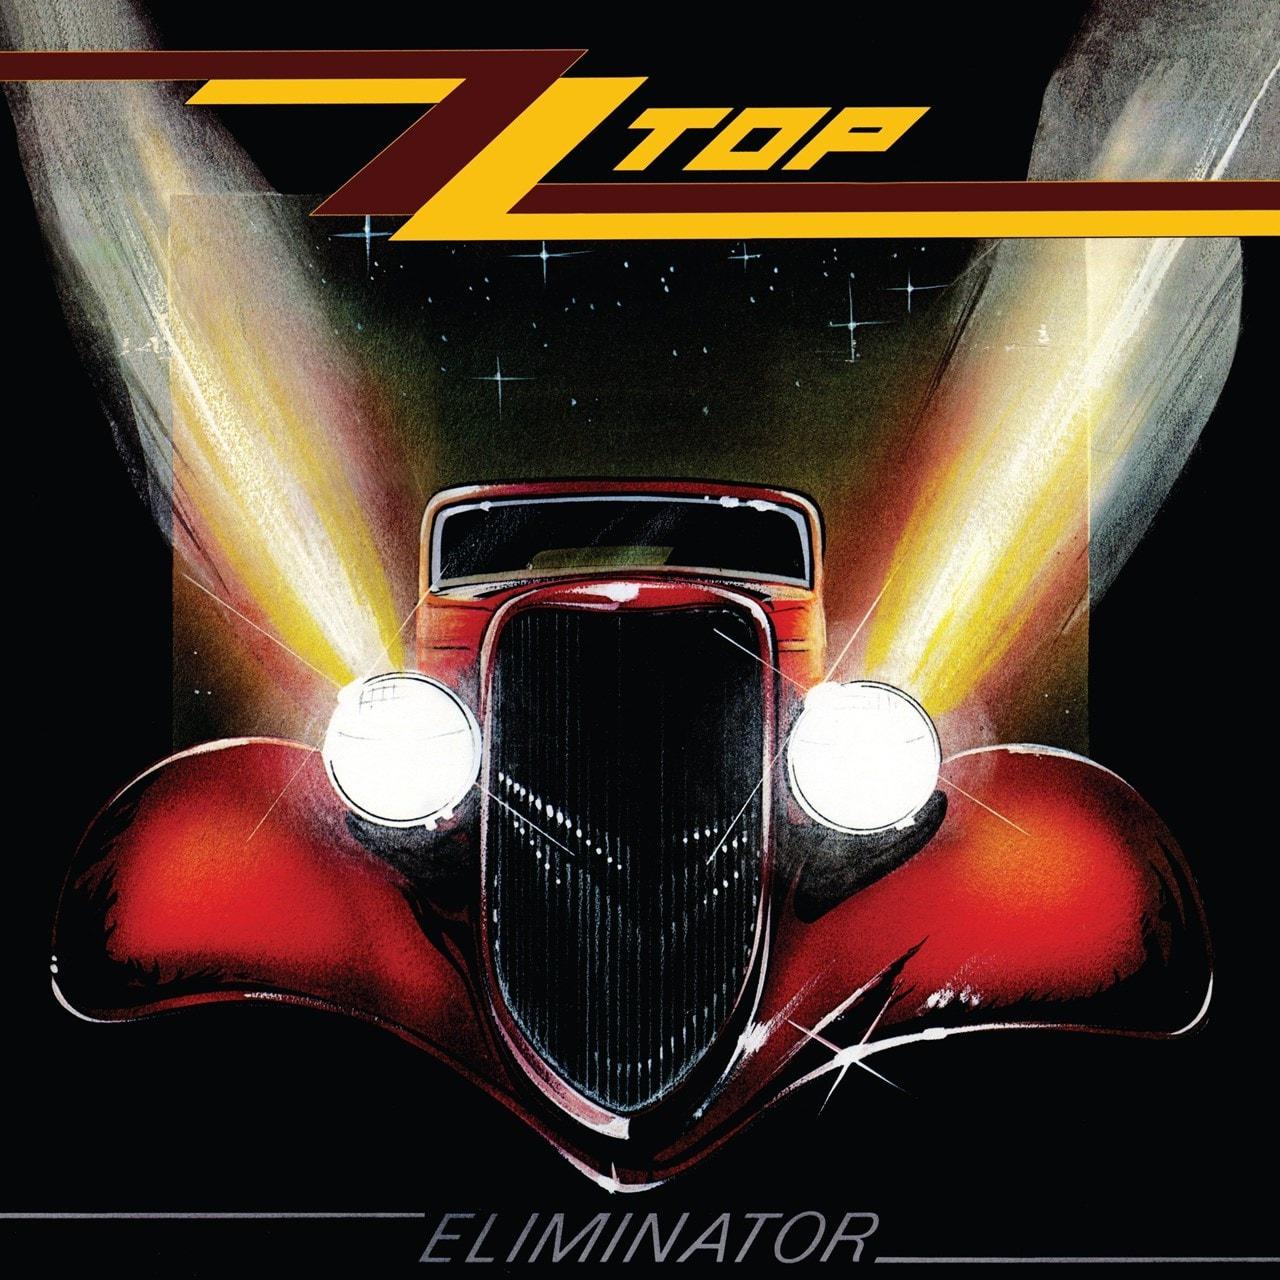 Eliminator - Limited Edition Yellow Vinyl (NAD20) - 1